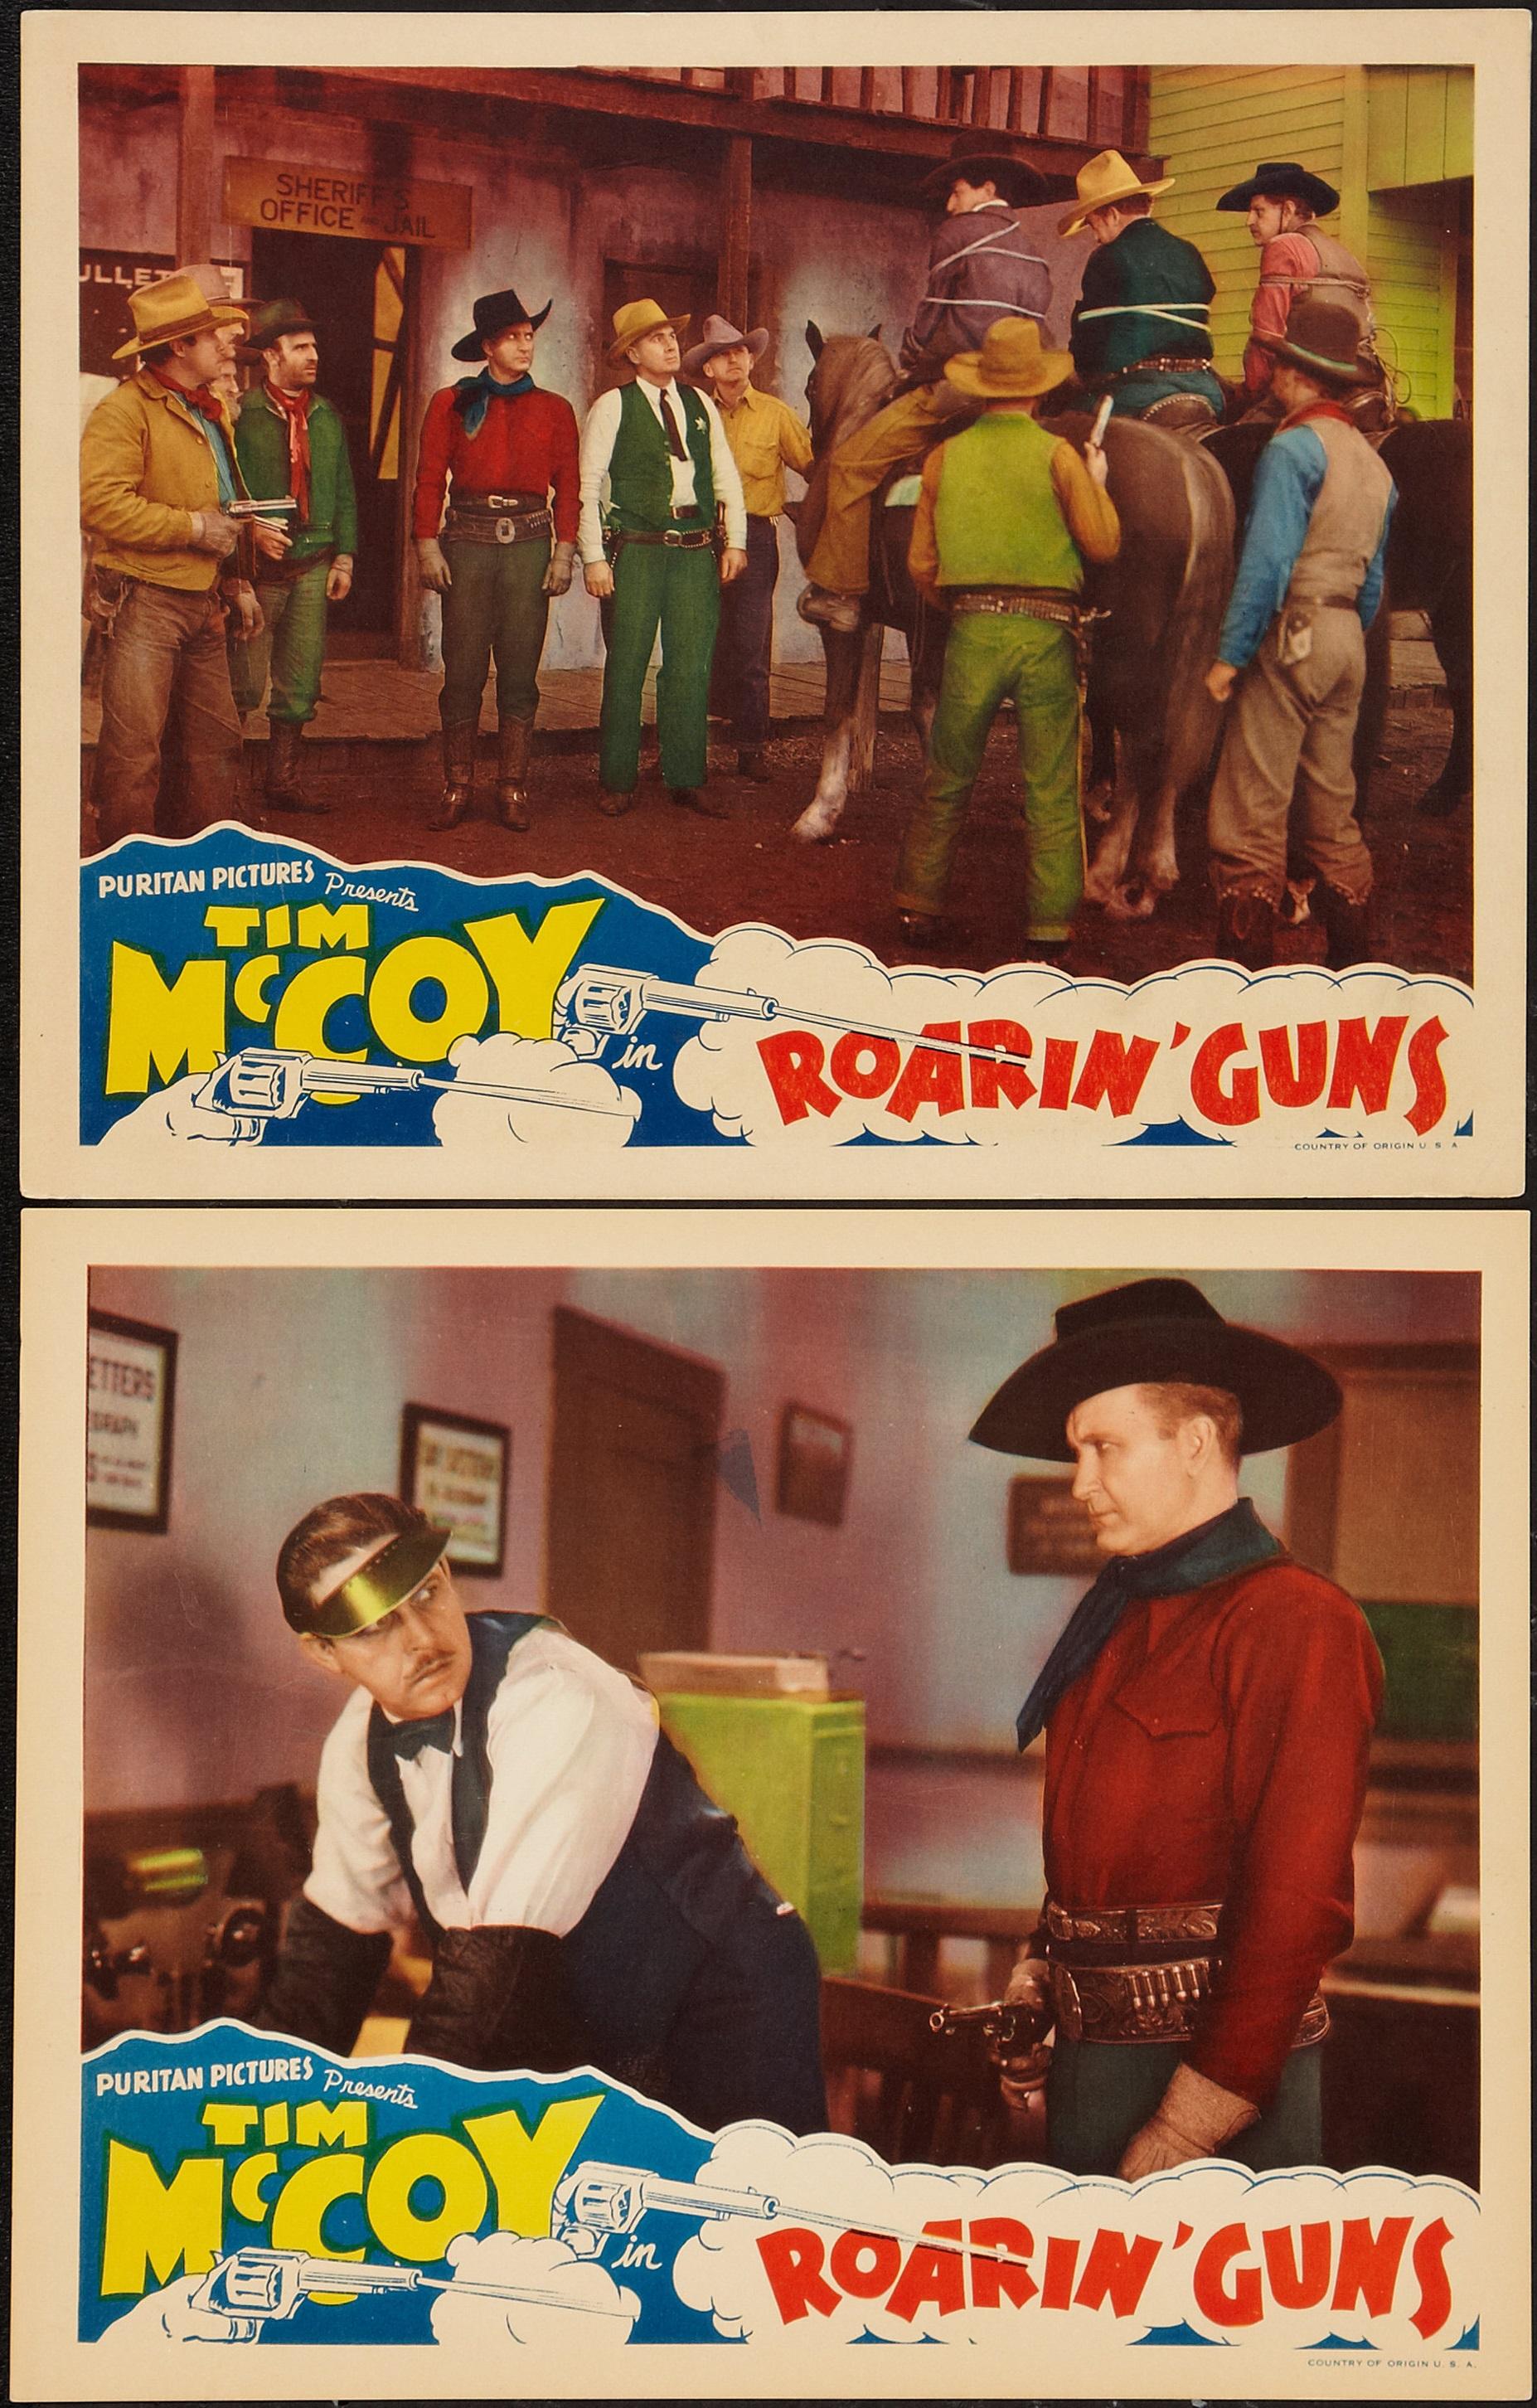 Tim McCoy in Roarin' Guns (1936)